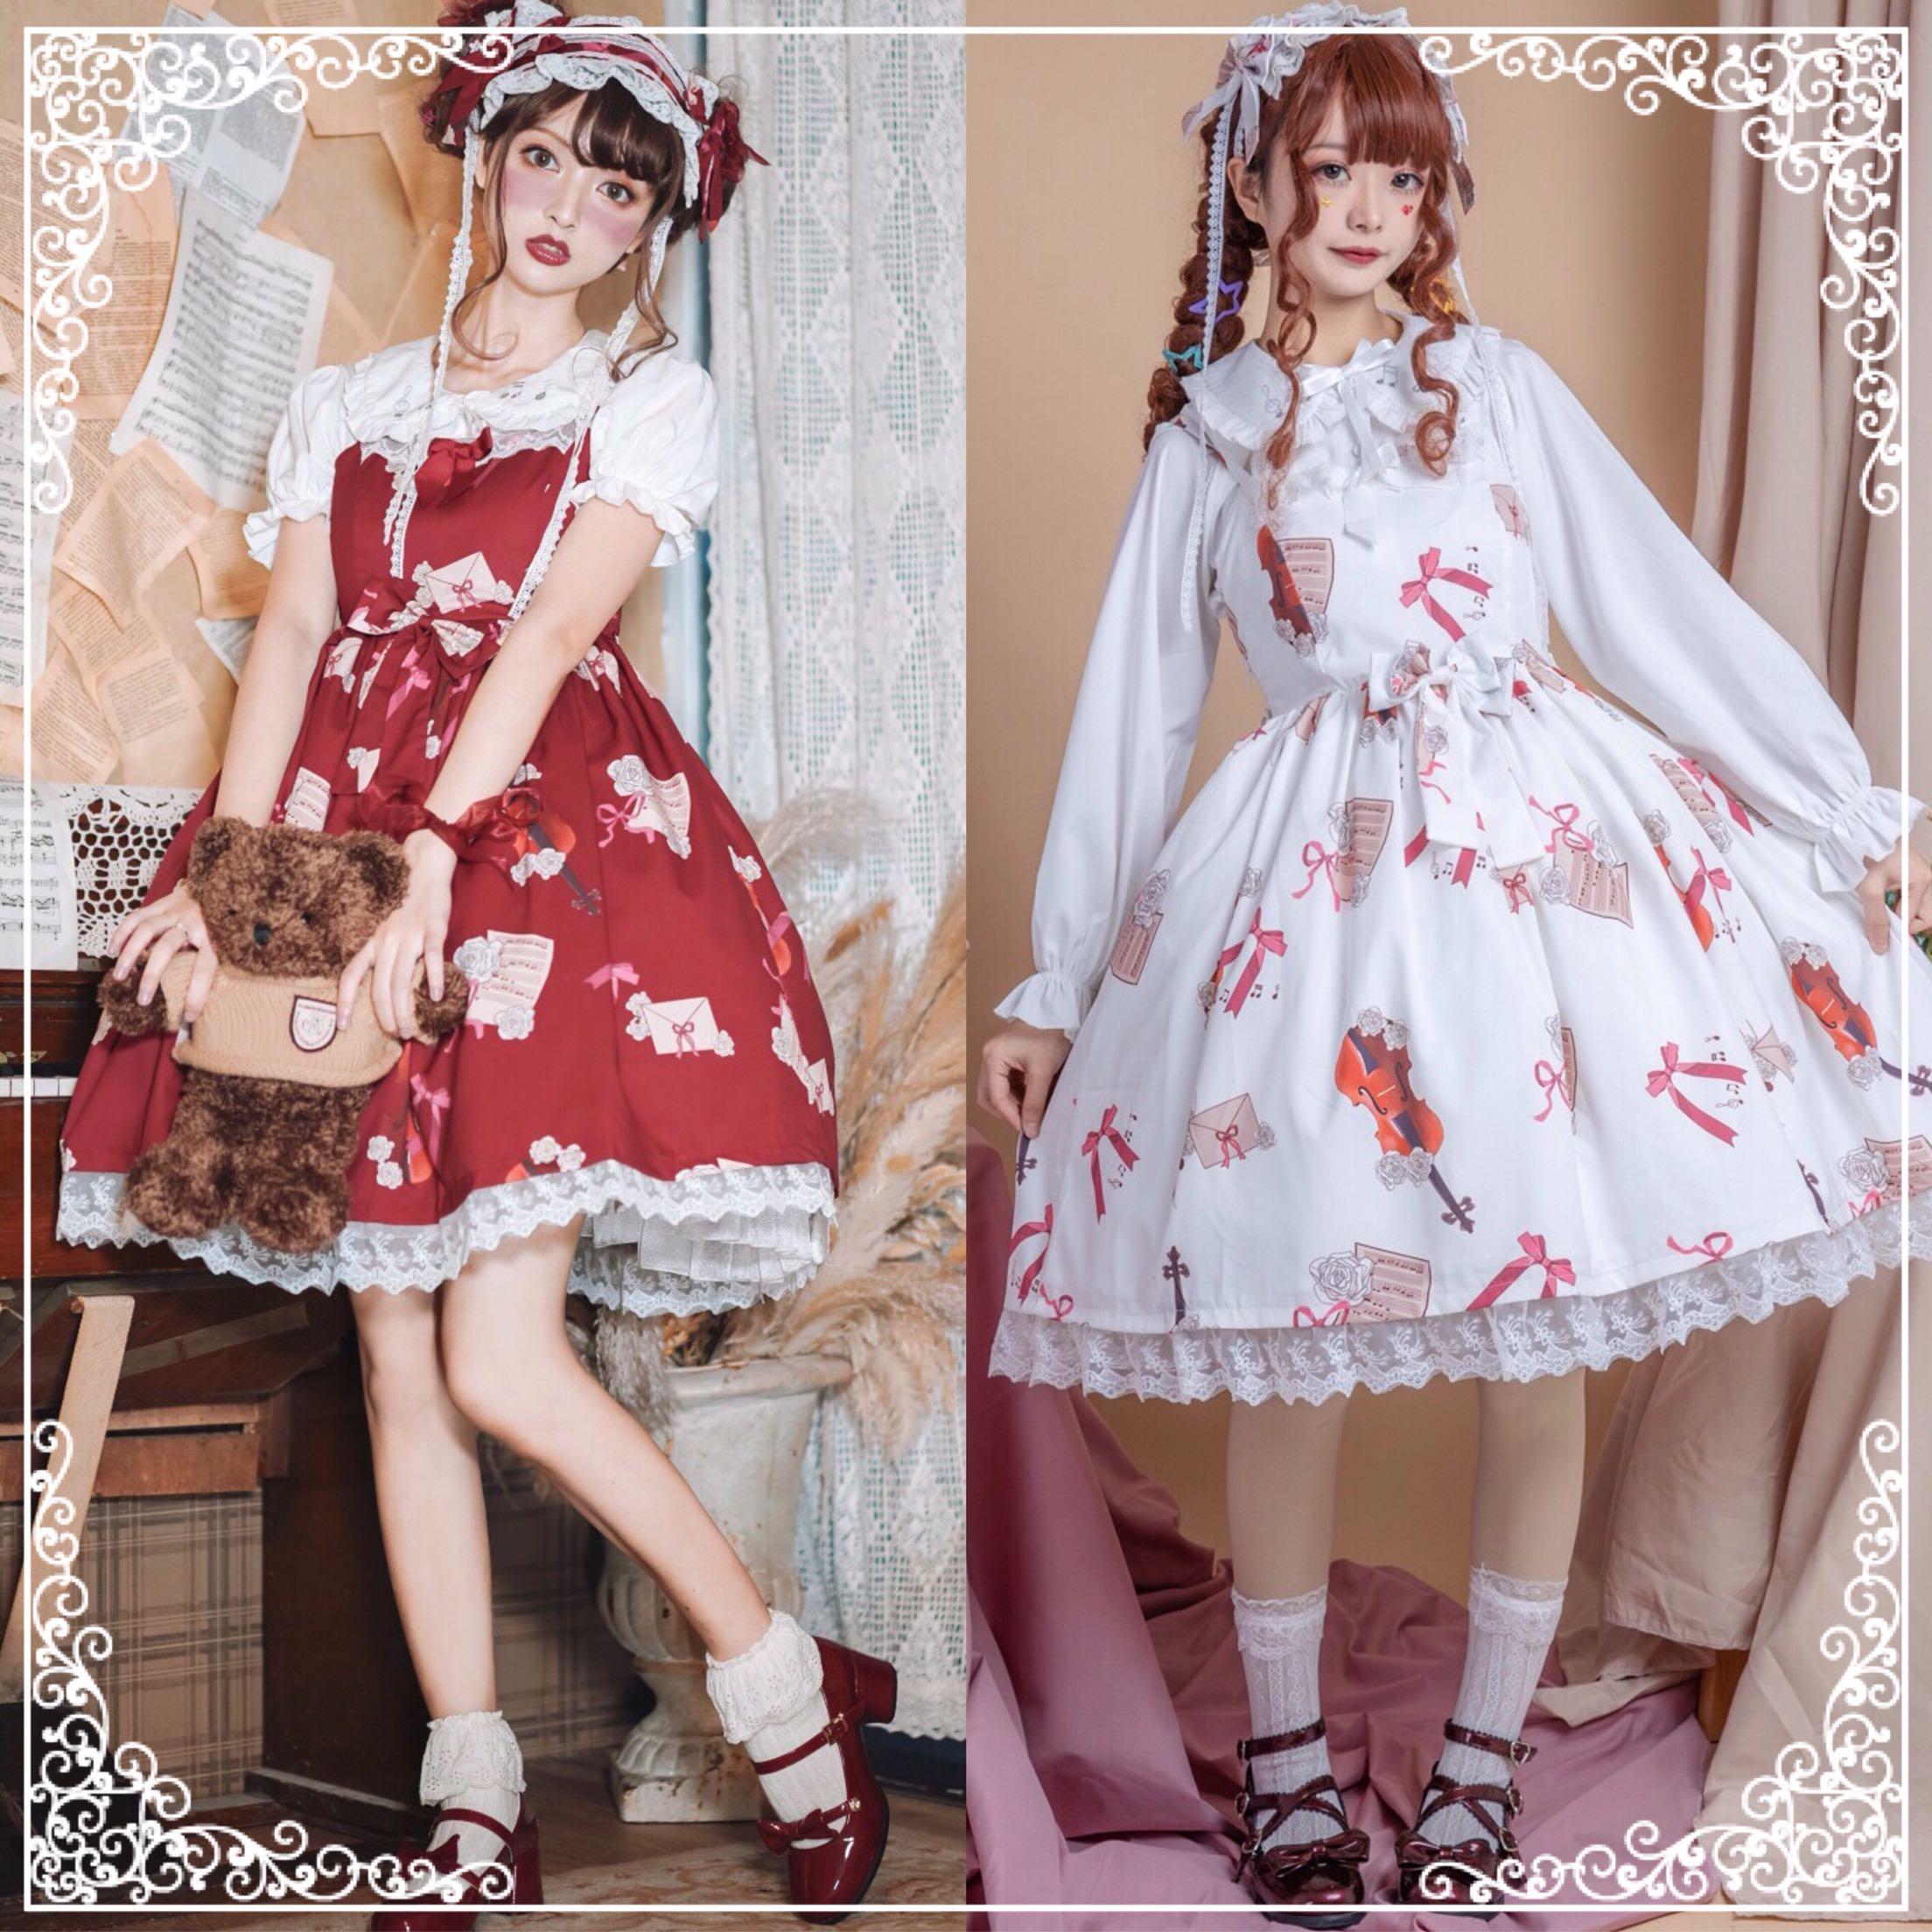 Japanese Sweet Lolita Dress Vintage Lace Bowknot Cute Printing High Waist Victorian Dress Kawaii Girl Gothic Lolita Jsk Loli Cos